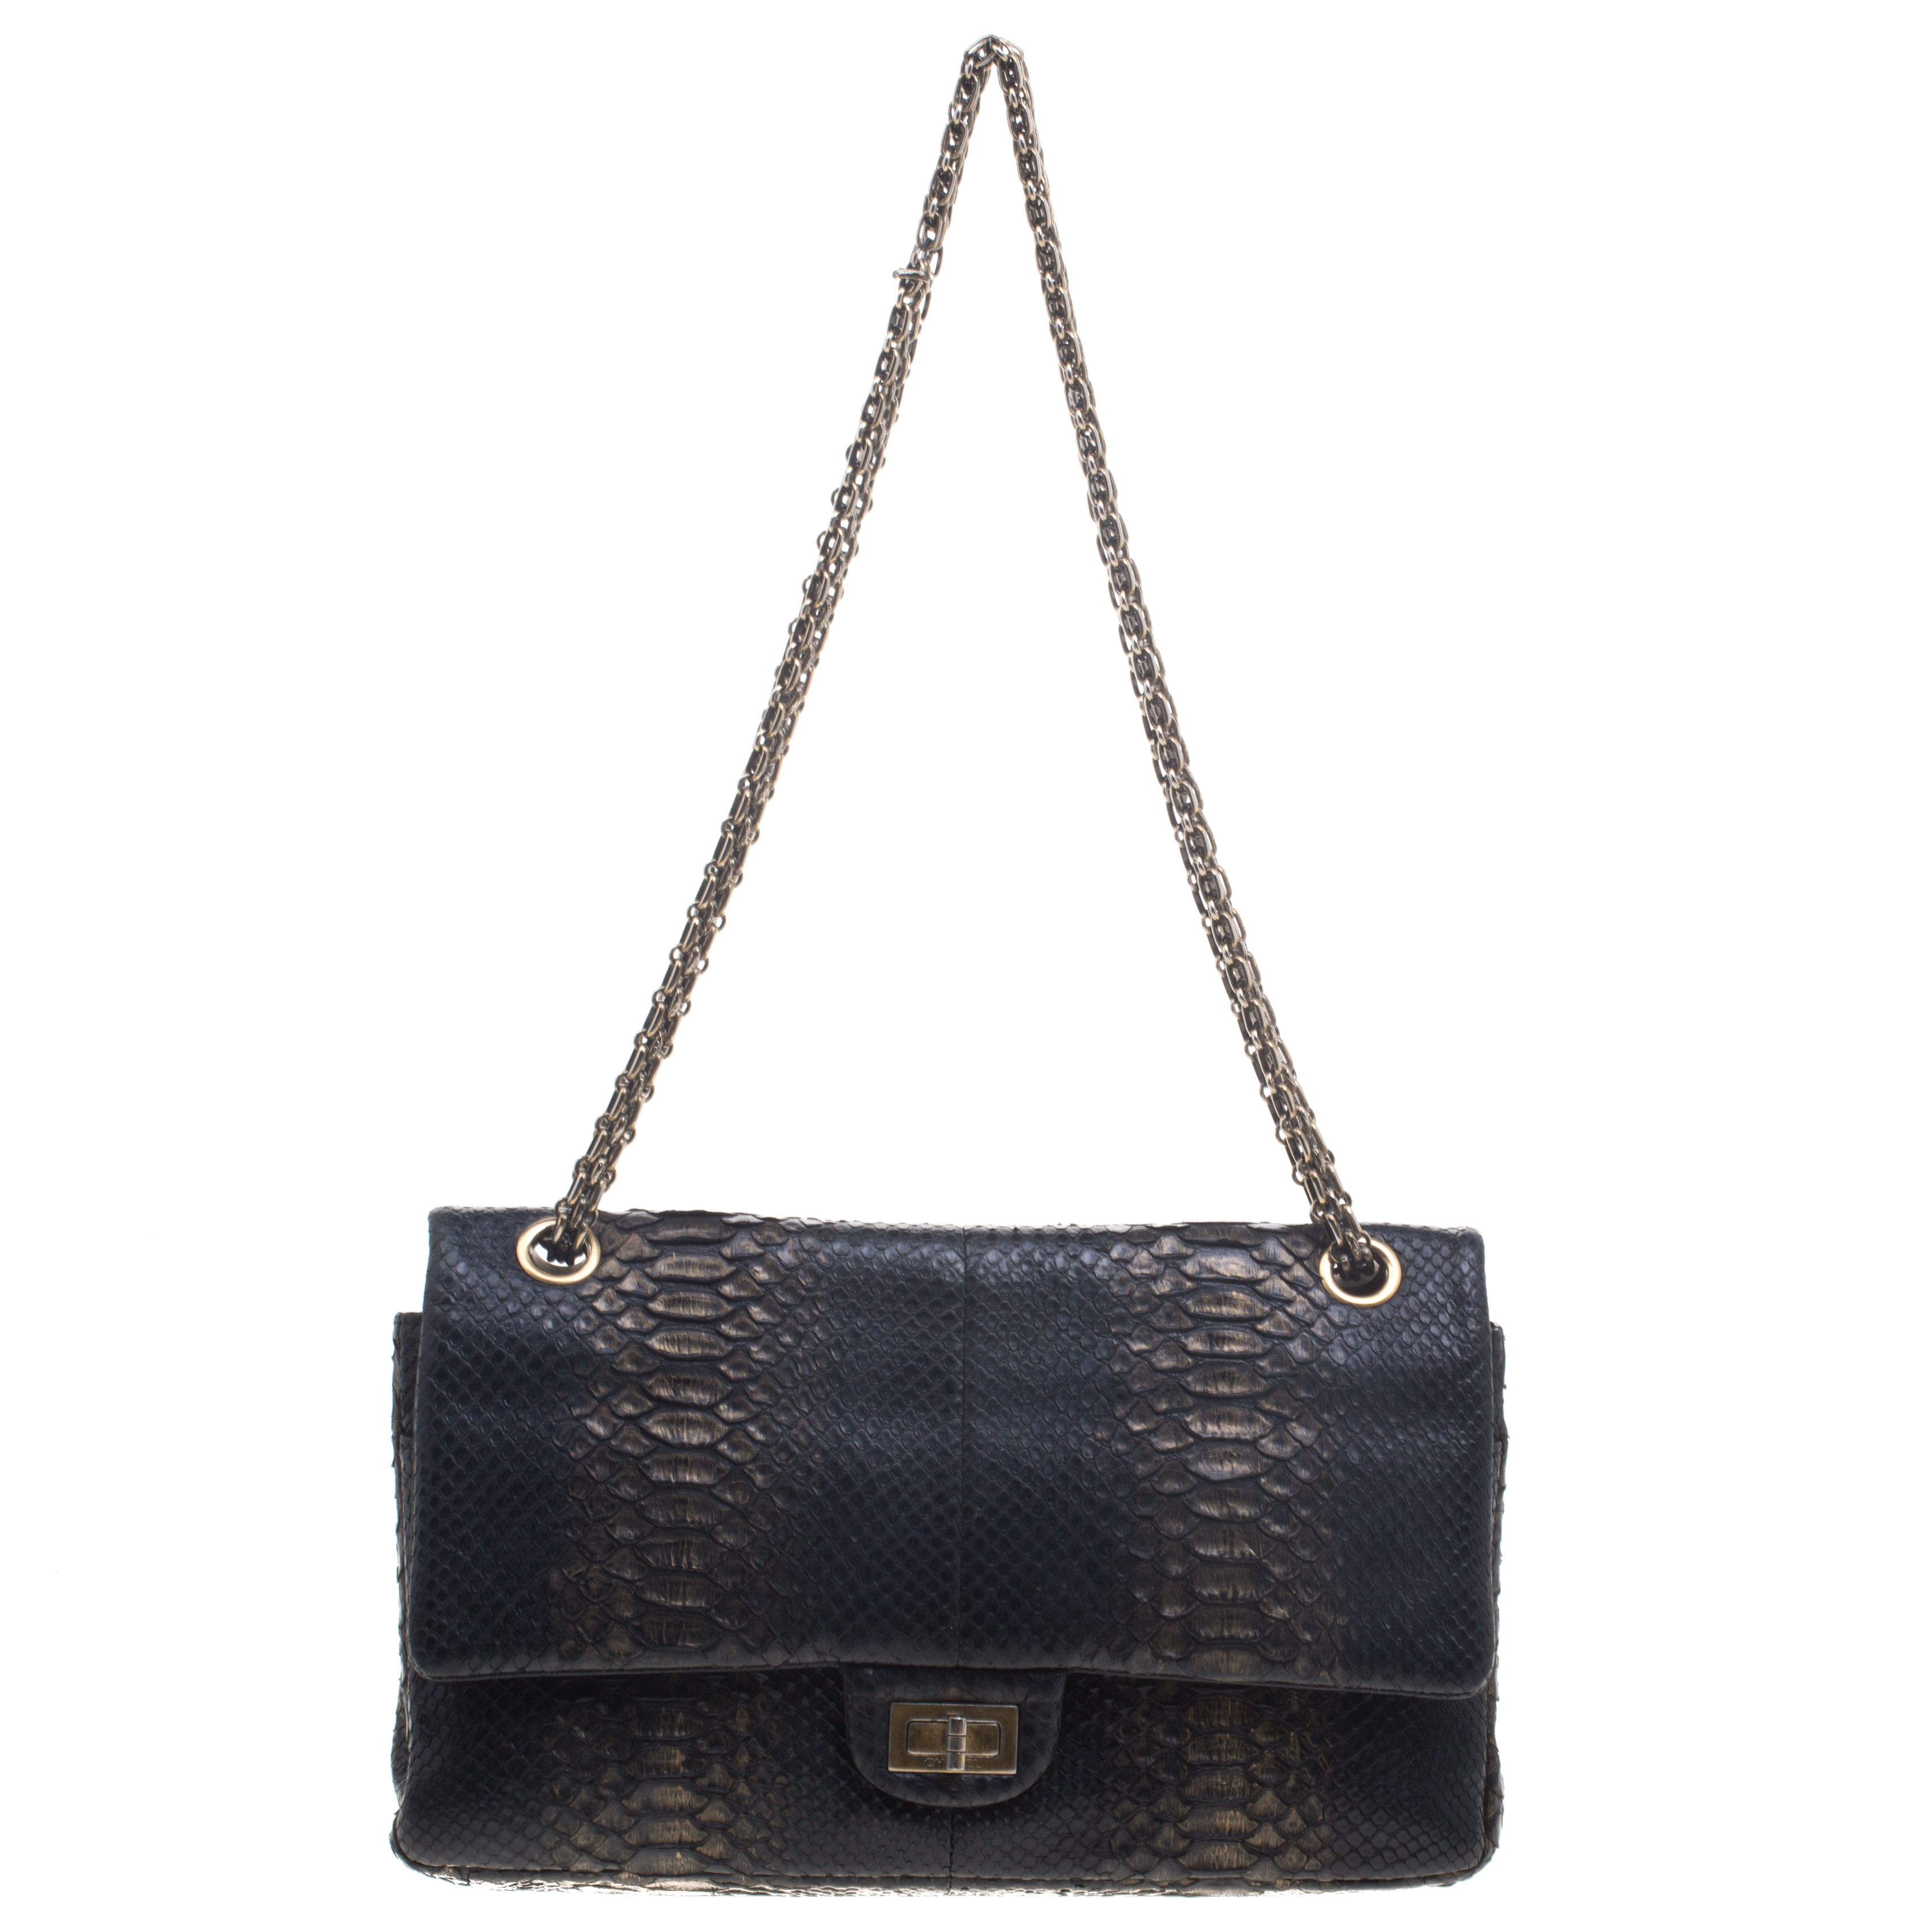 e1d733792d Buy Chanel Metallic Black Gold Python Reissue 2.55 Classic 226 Flap ...